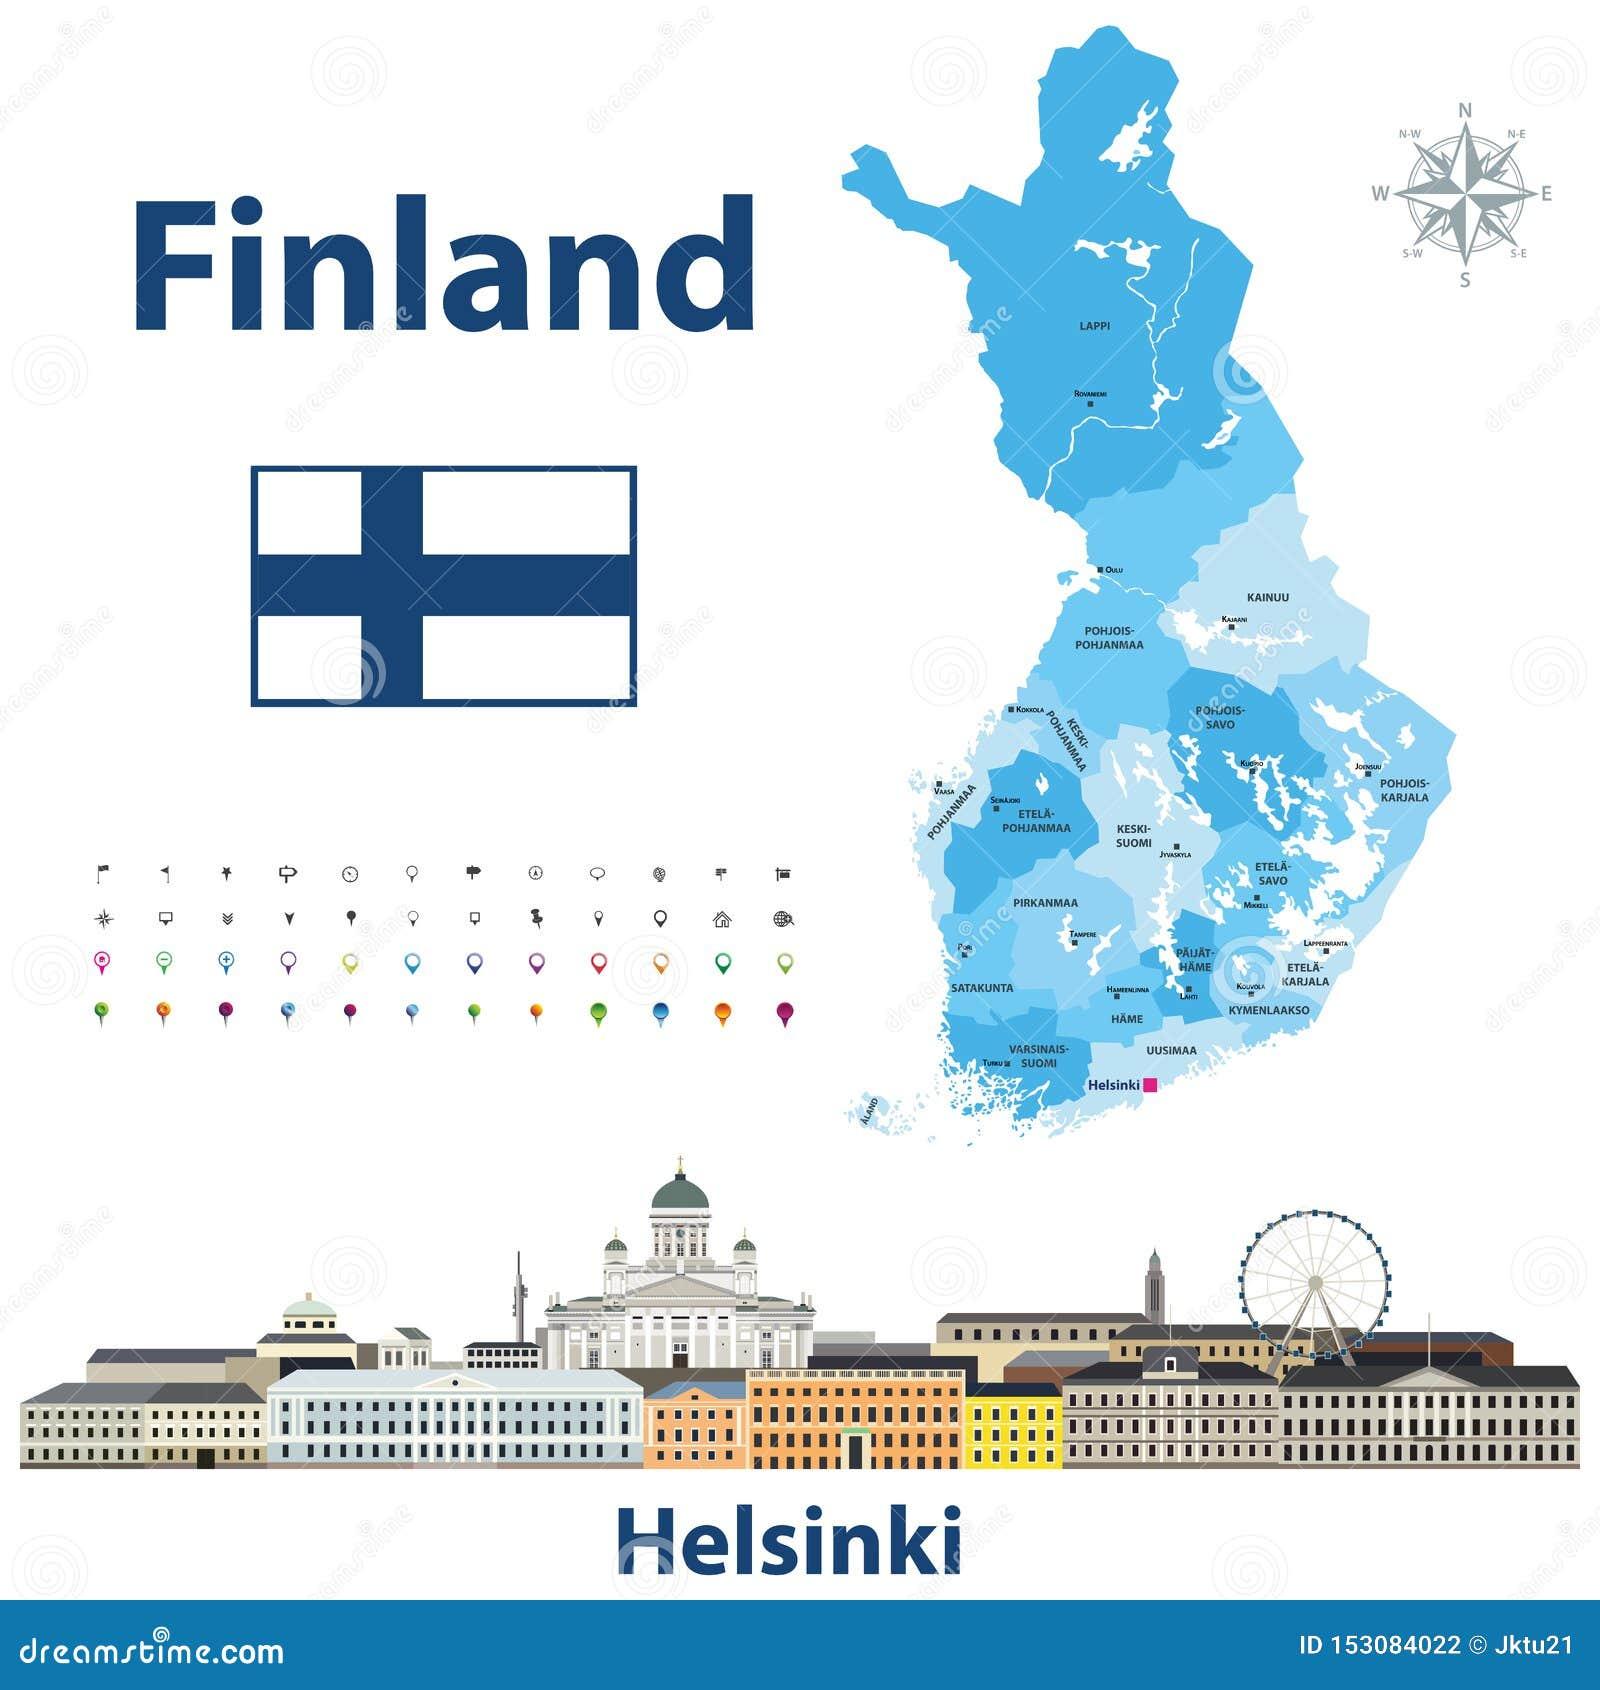 finland capital name